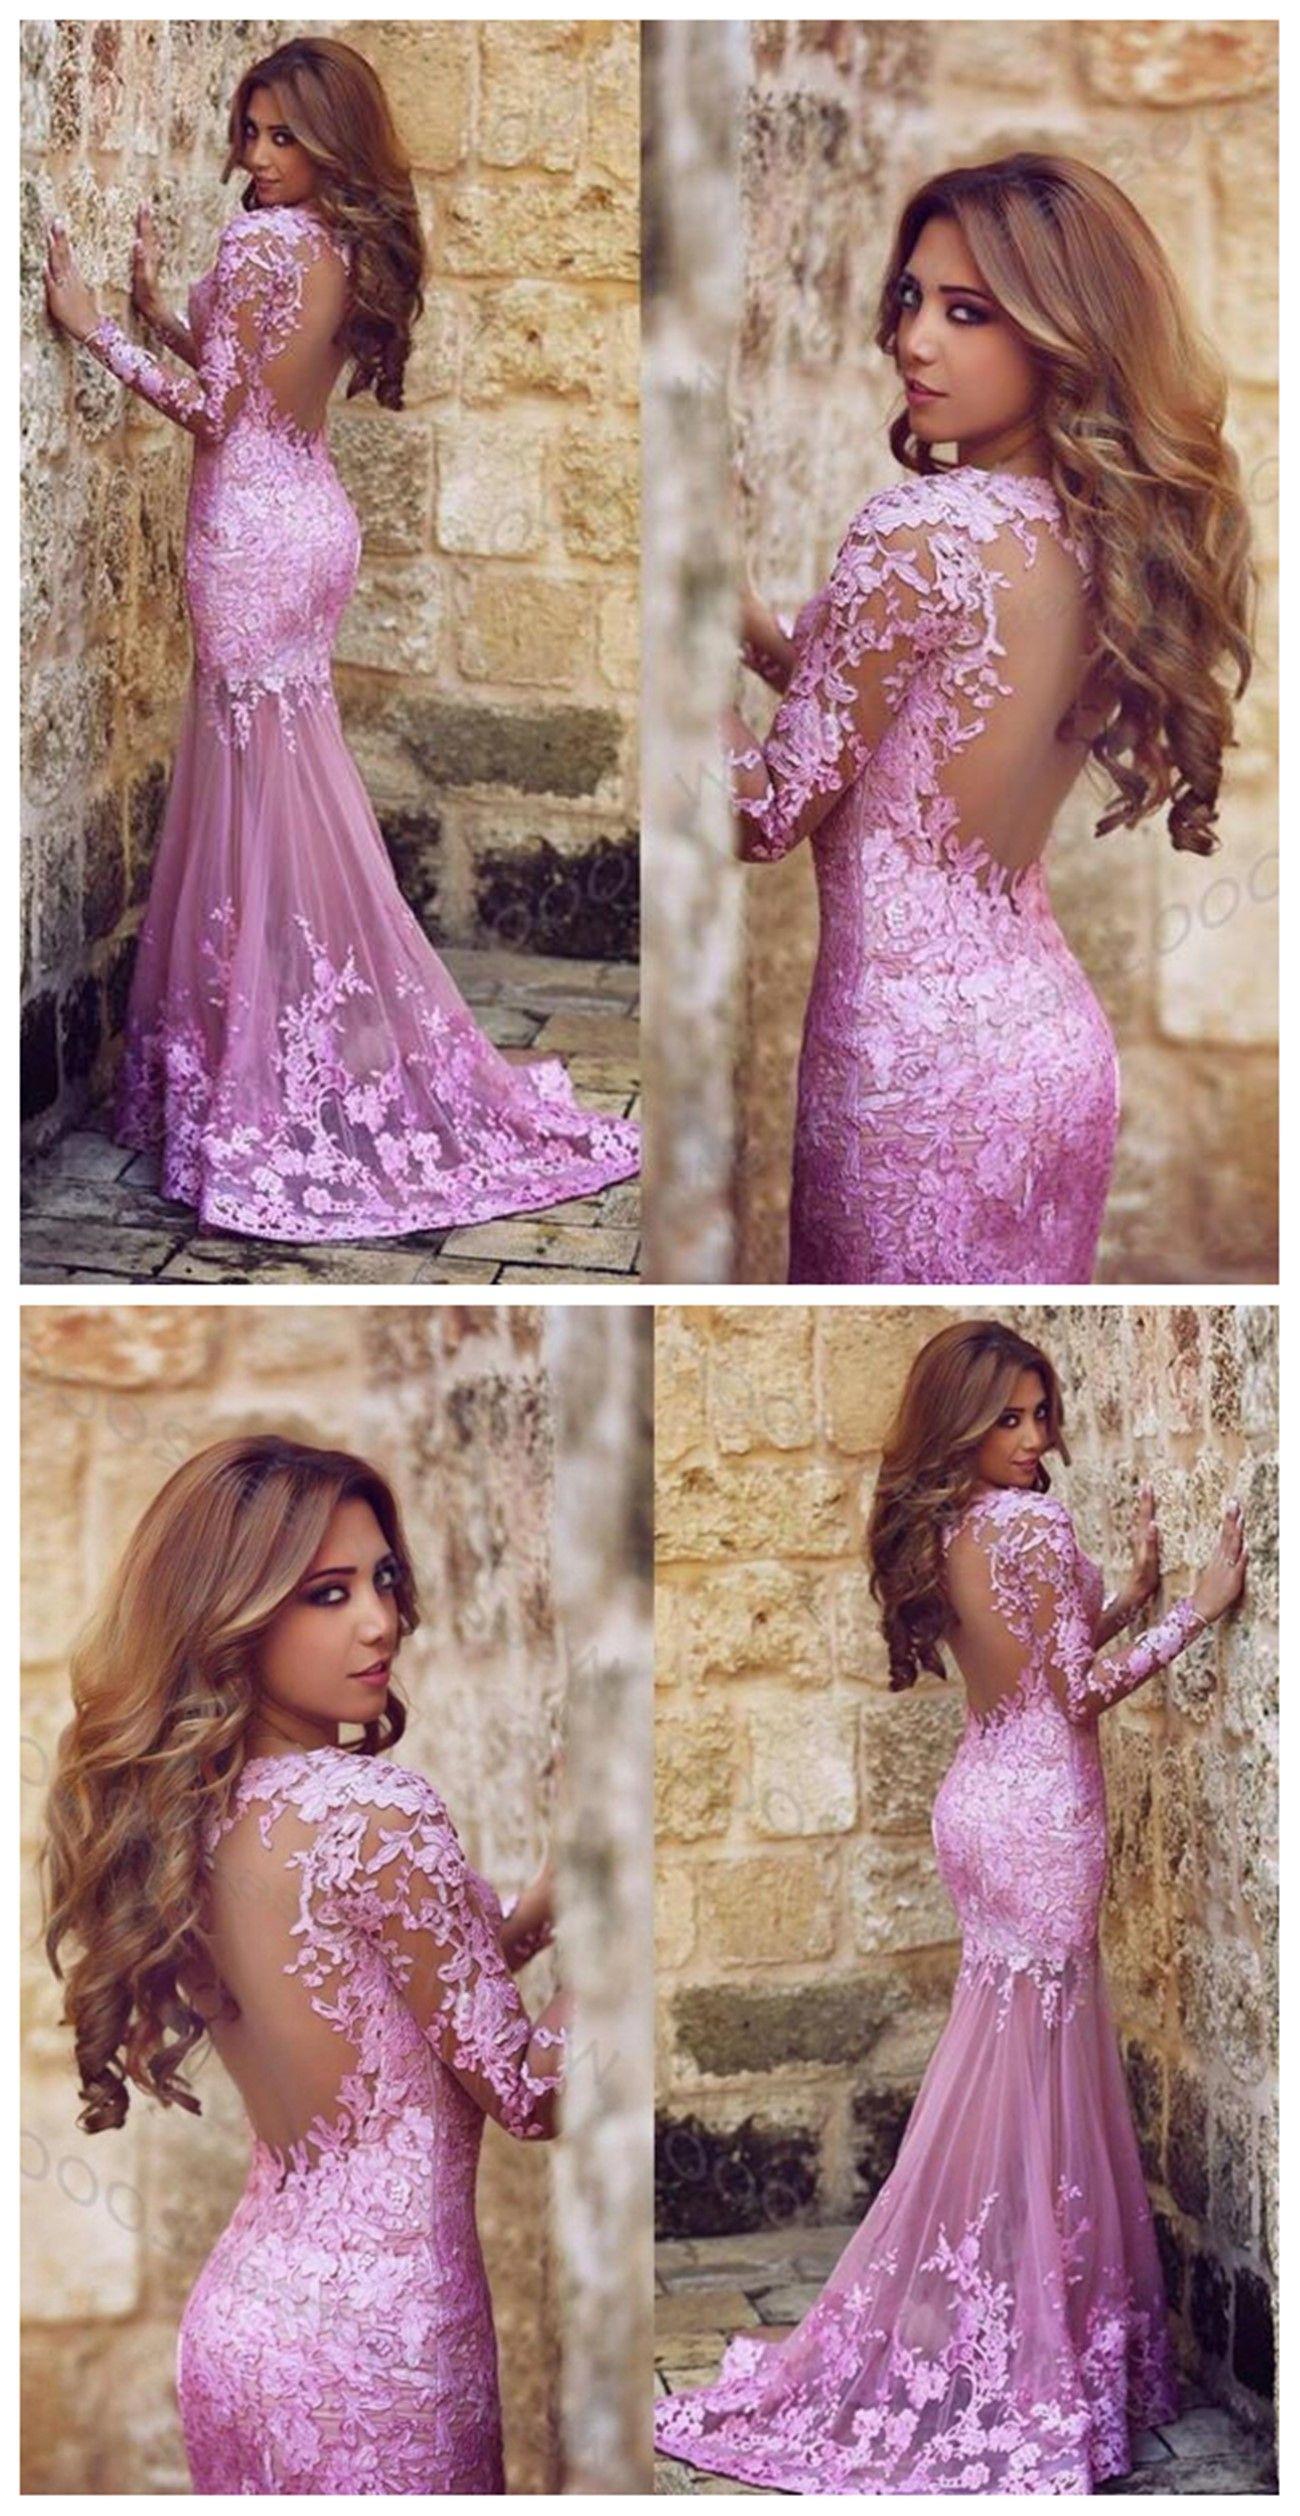 Lace lilac prom dress catalog photo